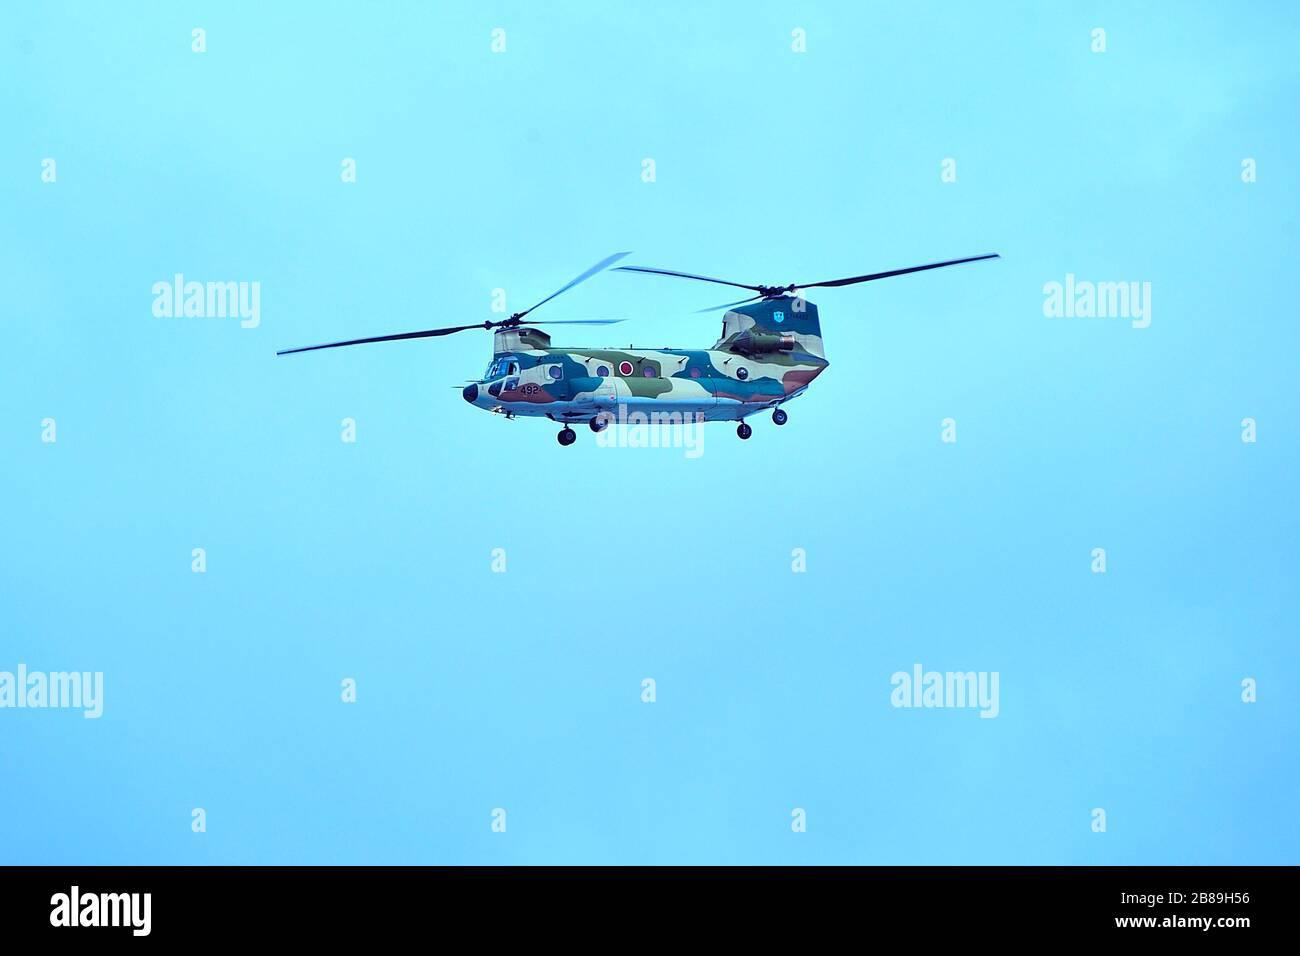 Japan Air Self-Defence Force, JASDF CH-47J, Boeing CH-47 Chinook,  Transport Helicopter, Naha Air Base, Naha, Okinawa, Ryukyu Islands, Japan Stock Photo